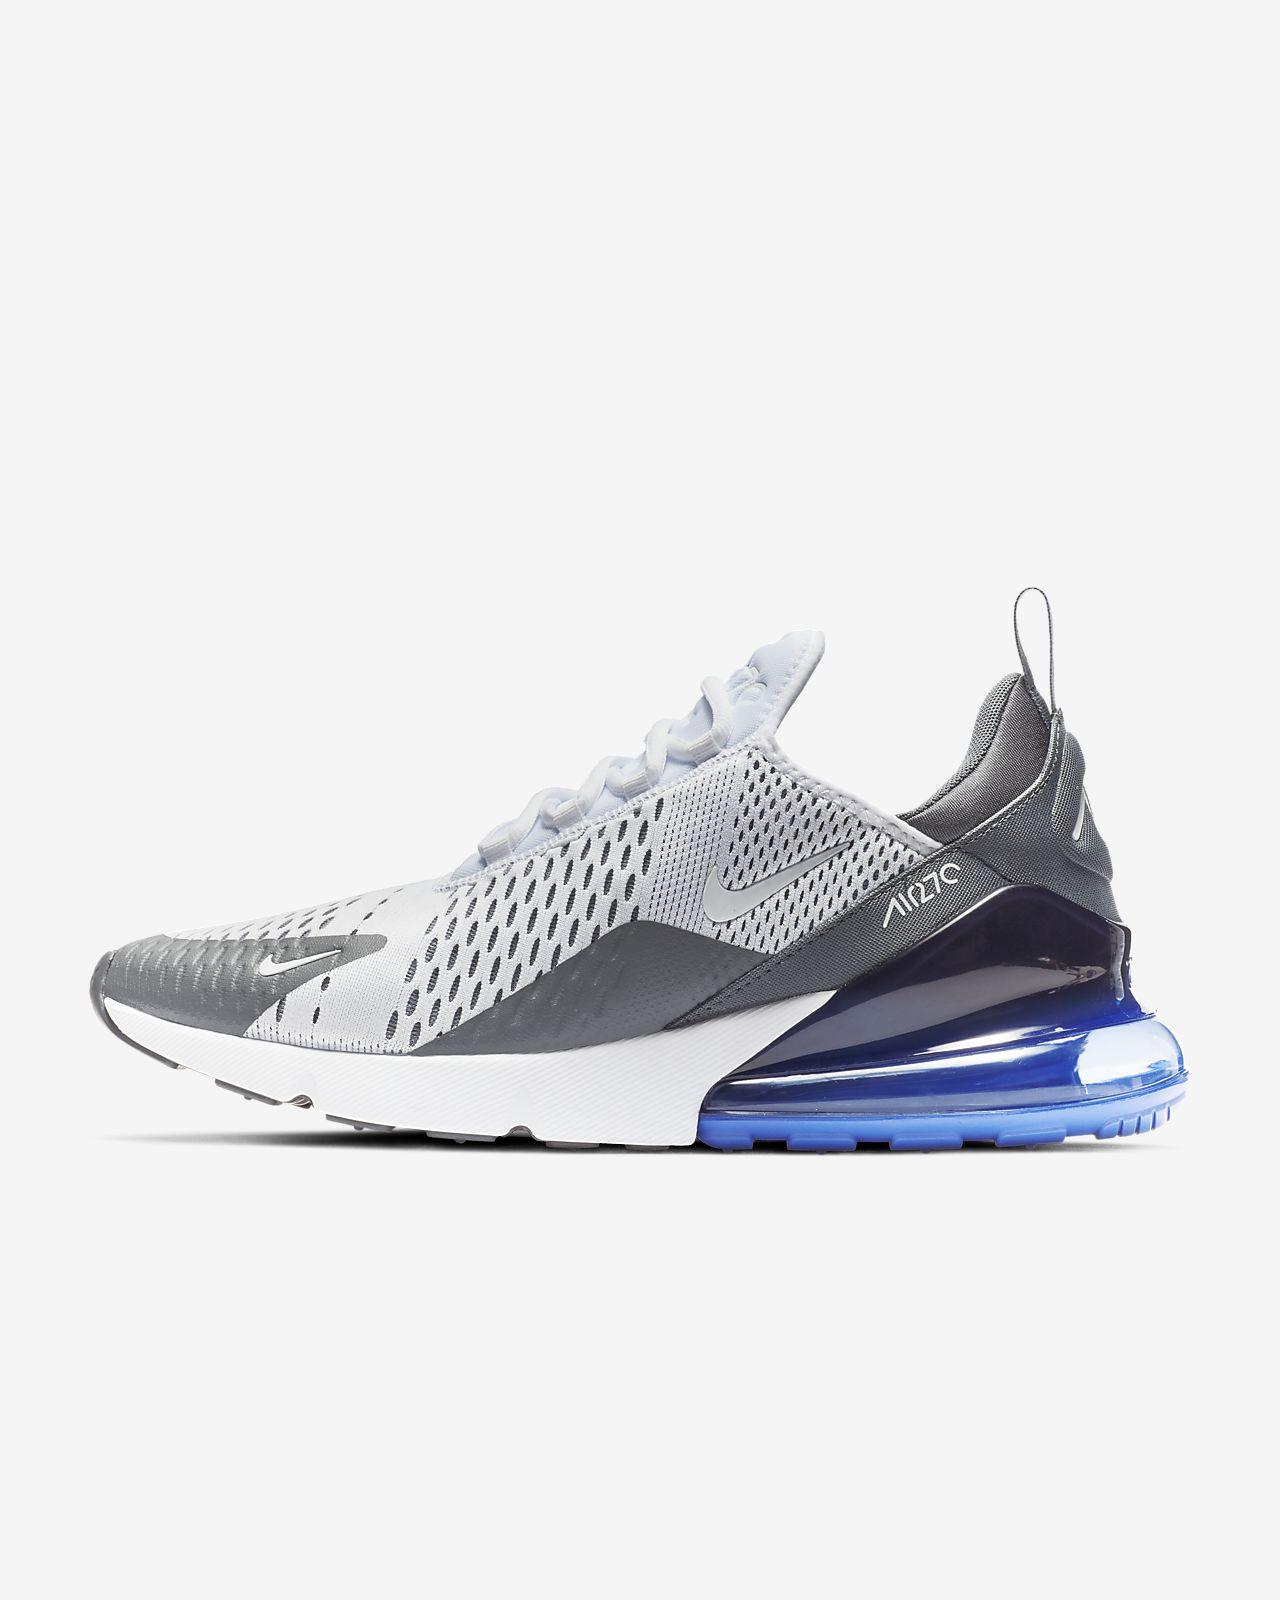 cheap for discount 85a7d f6e52 ... Chaussure Nike Air Max 270 pour Homme